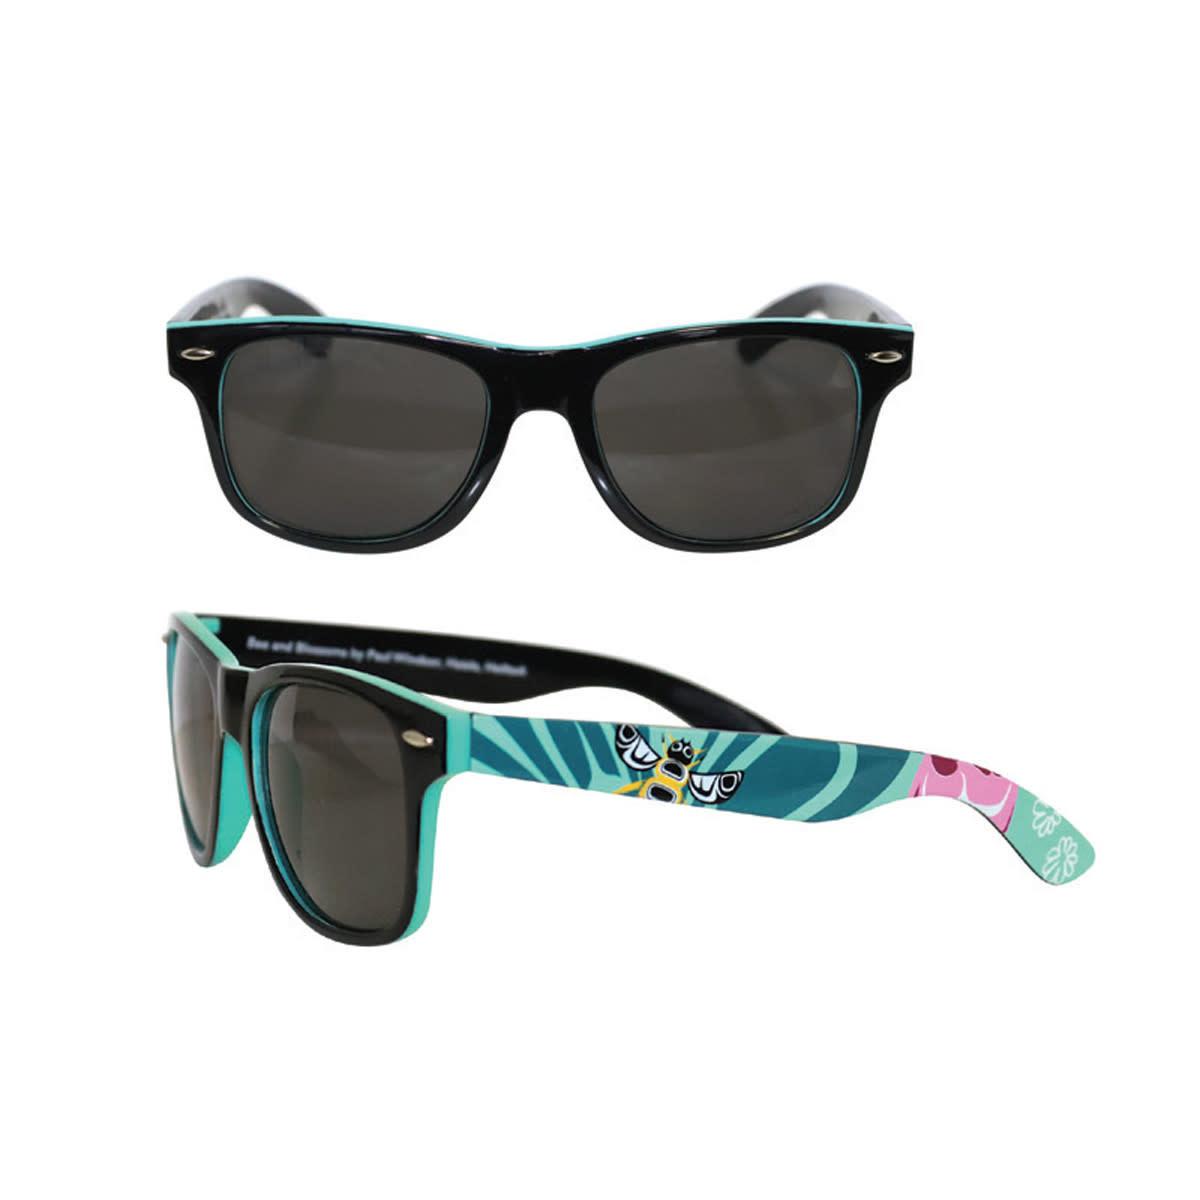 SunGlasses - Adult-9